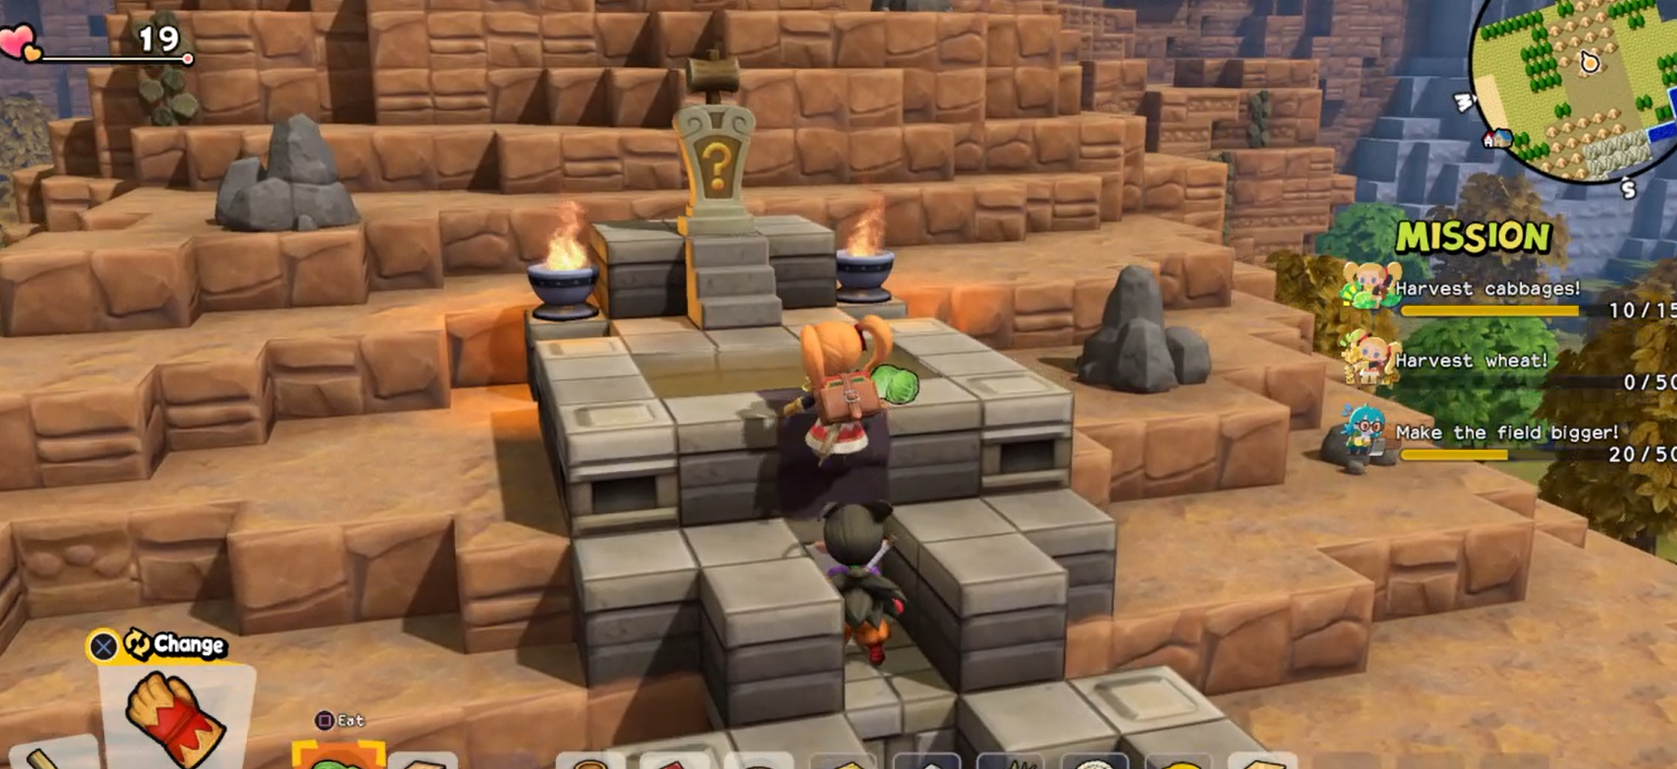 Dragon Quest Builders 2 - all 10 Furrowfield Shrine